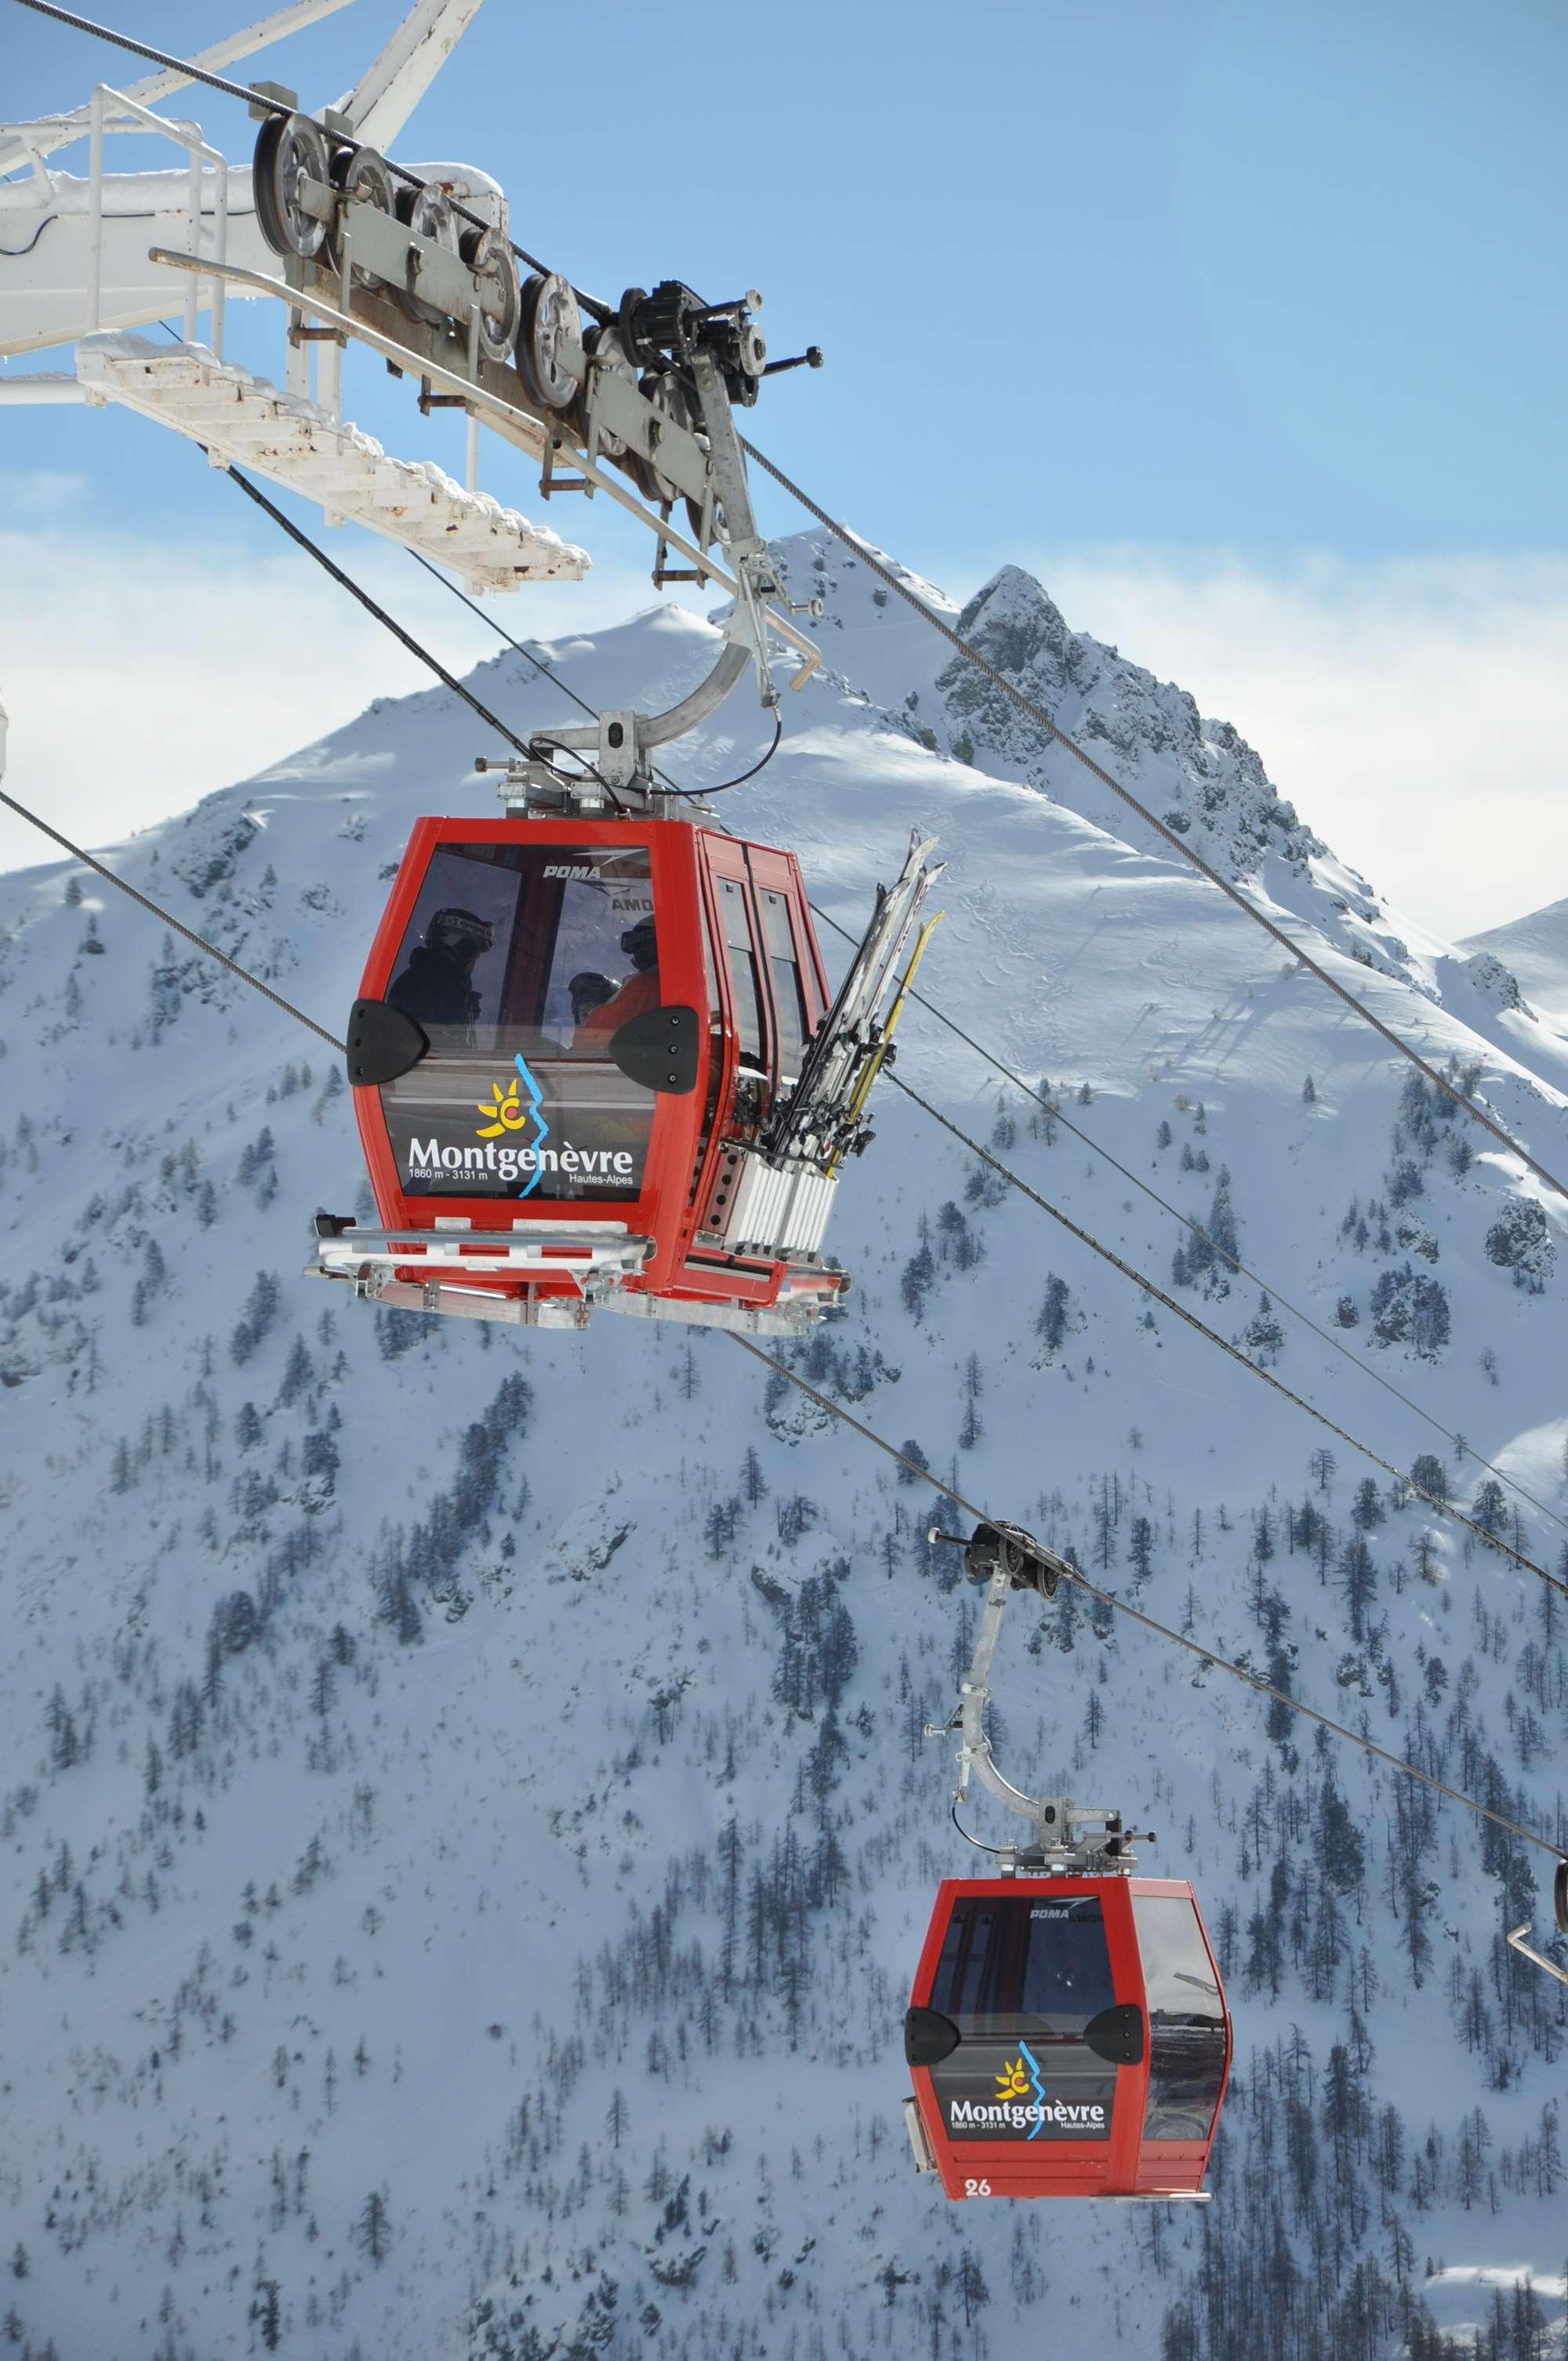 Gondola lift in Montgenevre